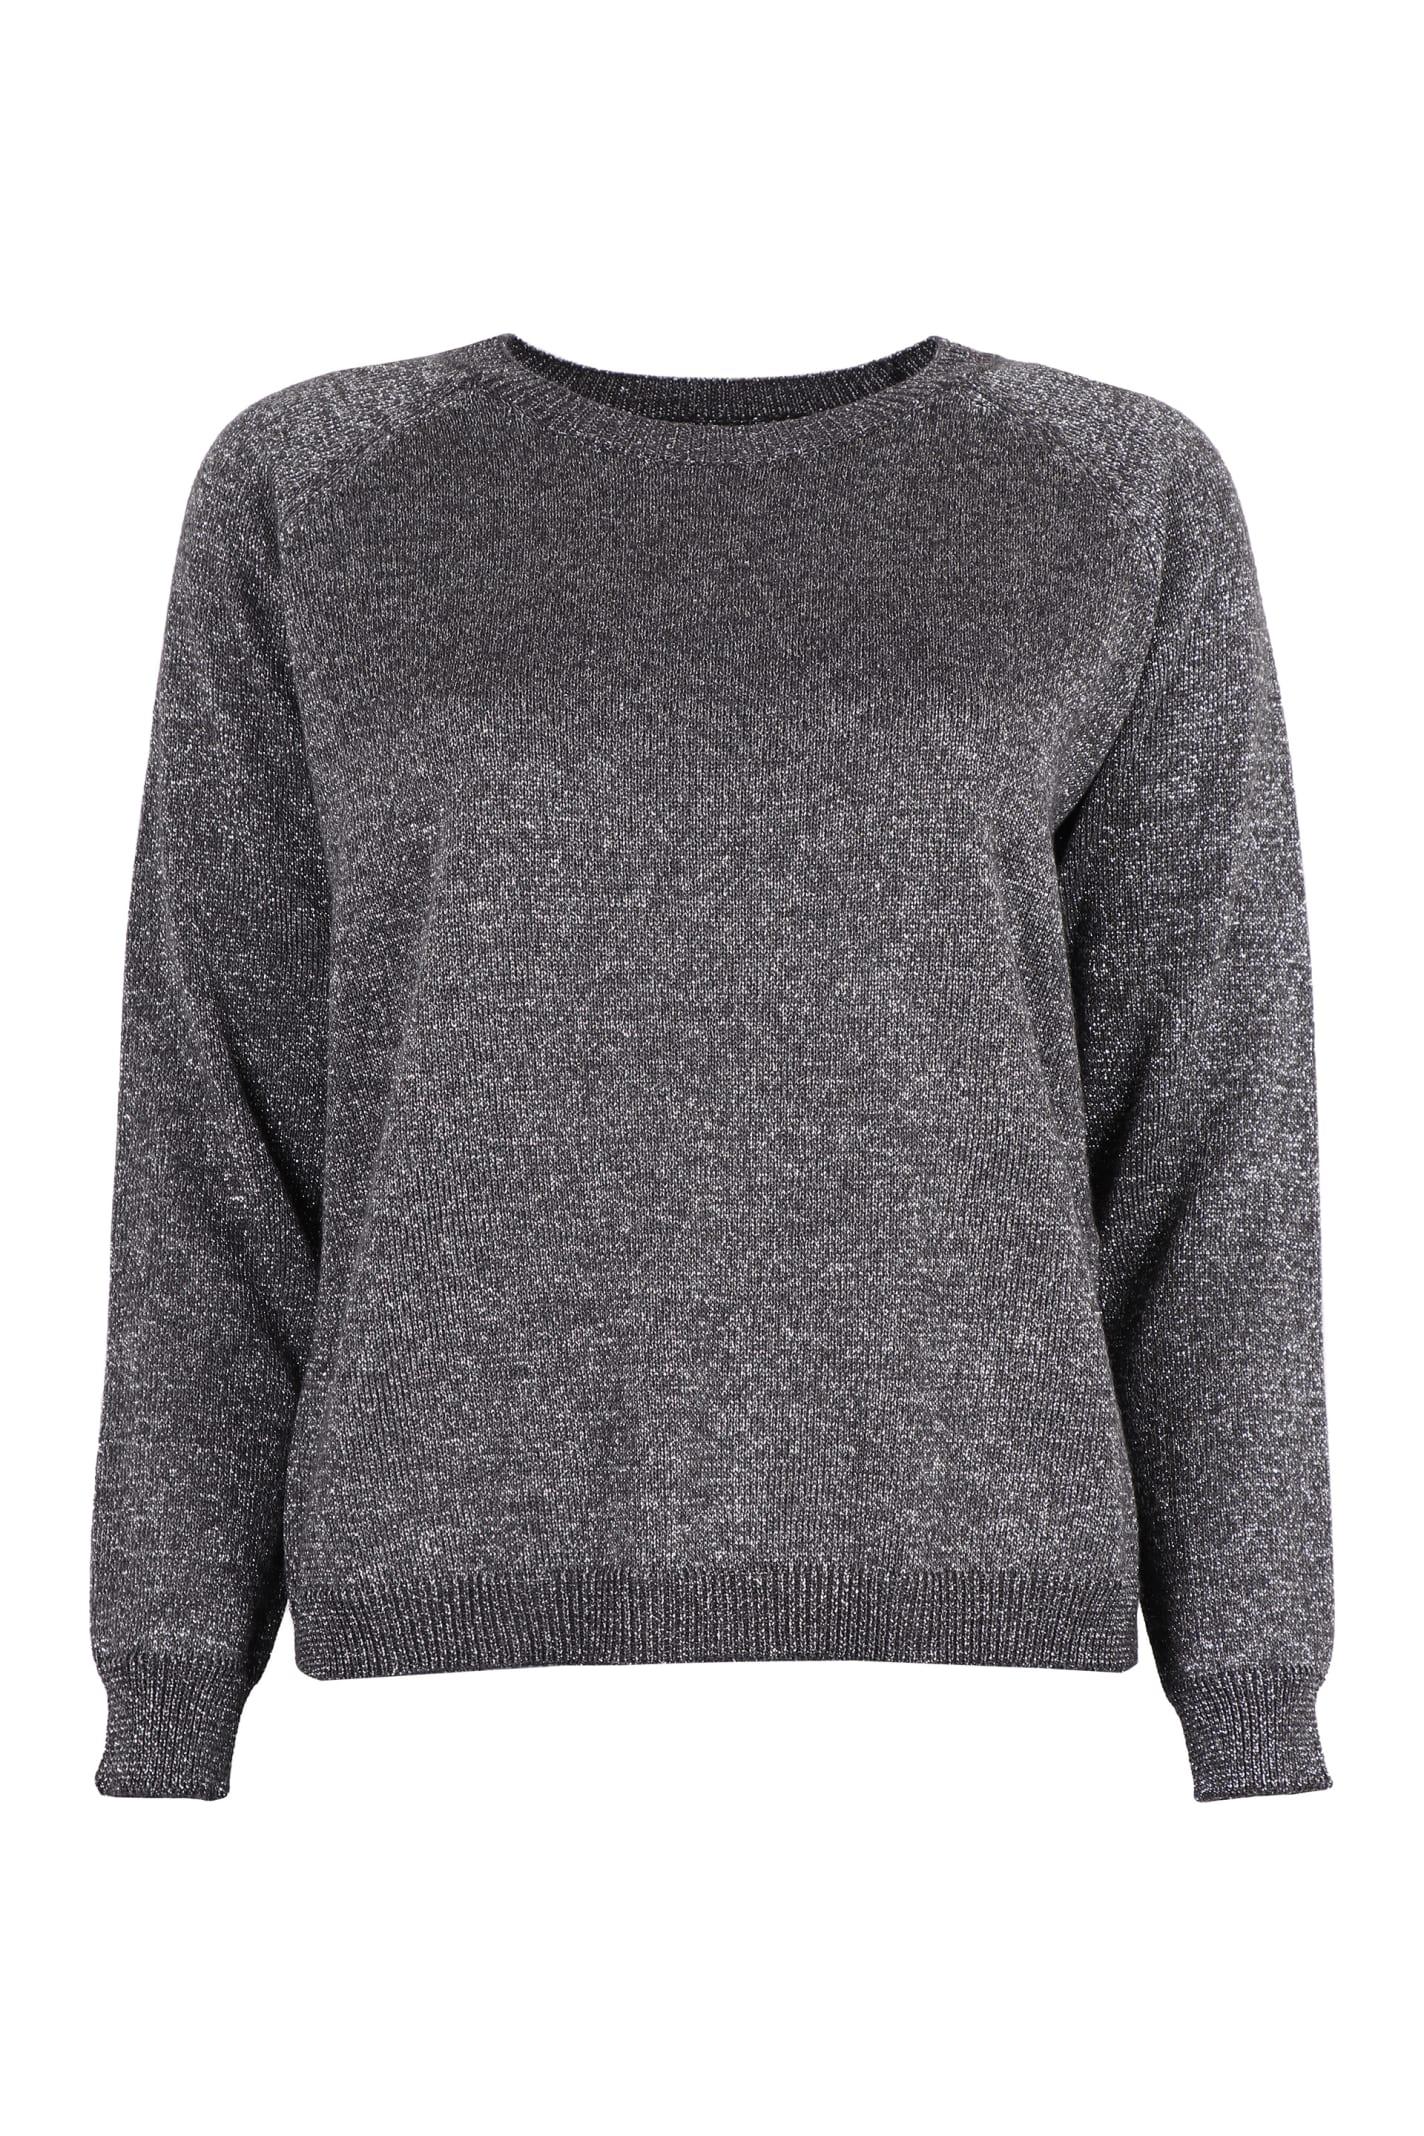 Weekend Max Mara Garonna Lurex Sweater